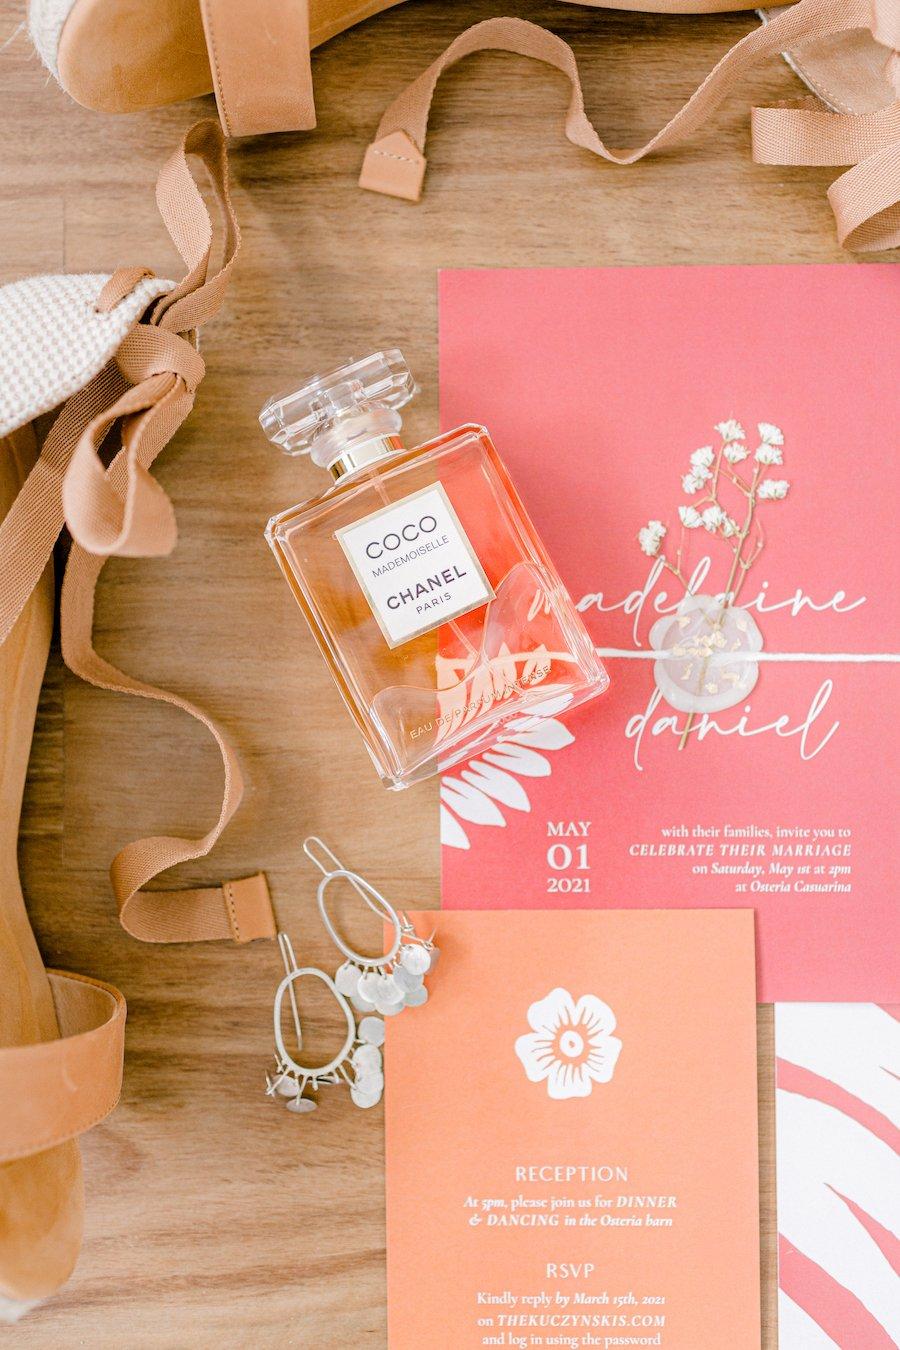 Wedding invitation and perfume